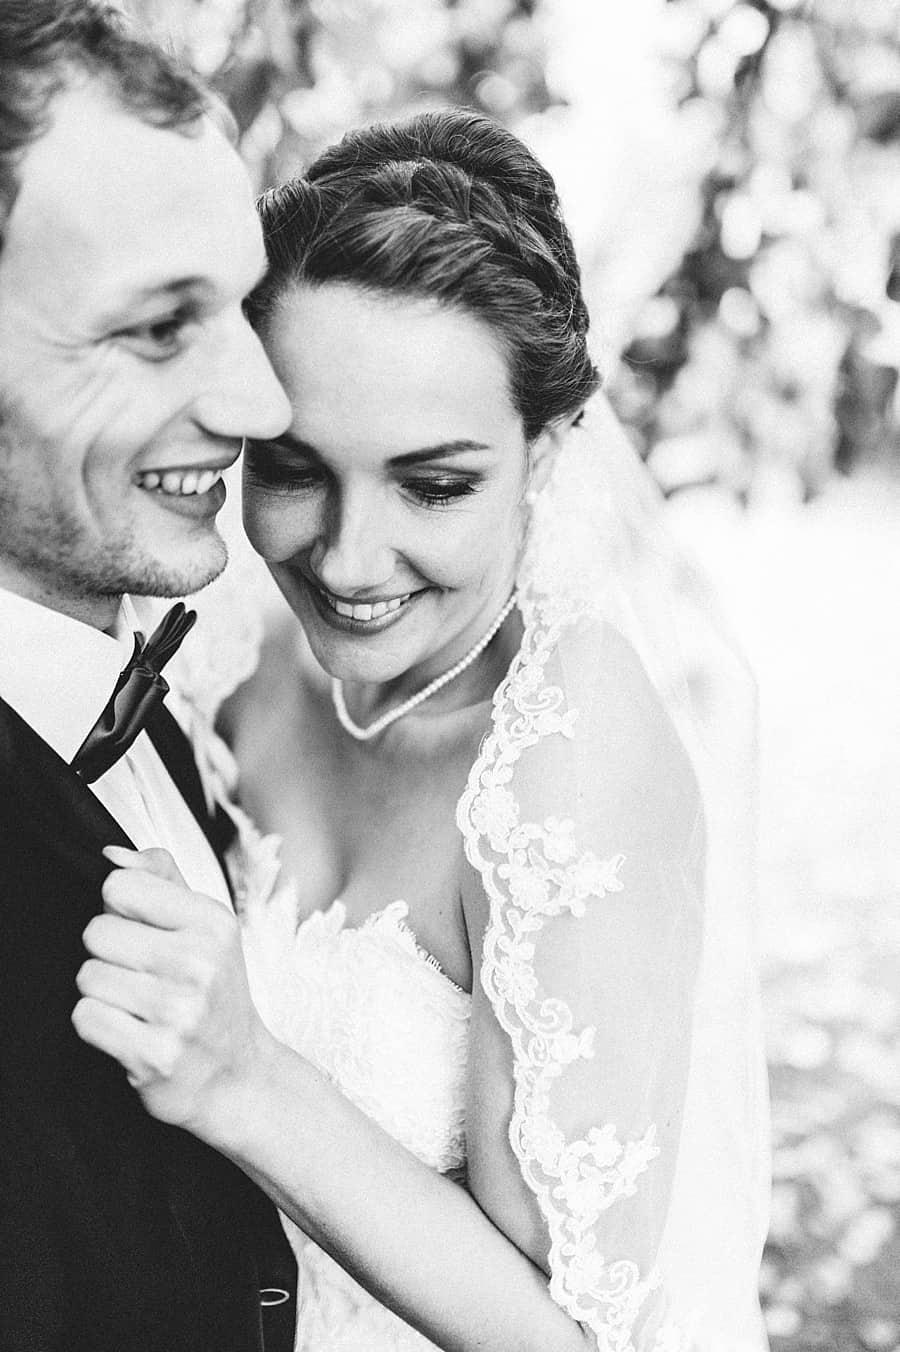 hochzeitsfotograf_thomasschwede_after_wedding_fotos_auf_fehmarn_0293